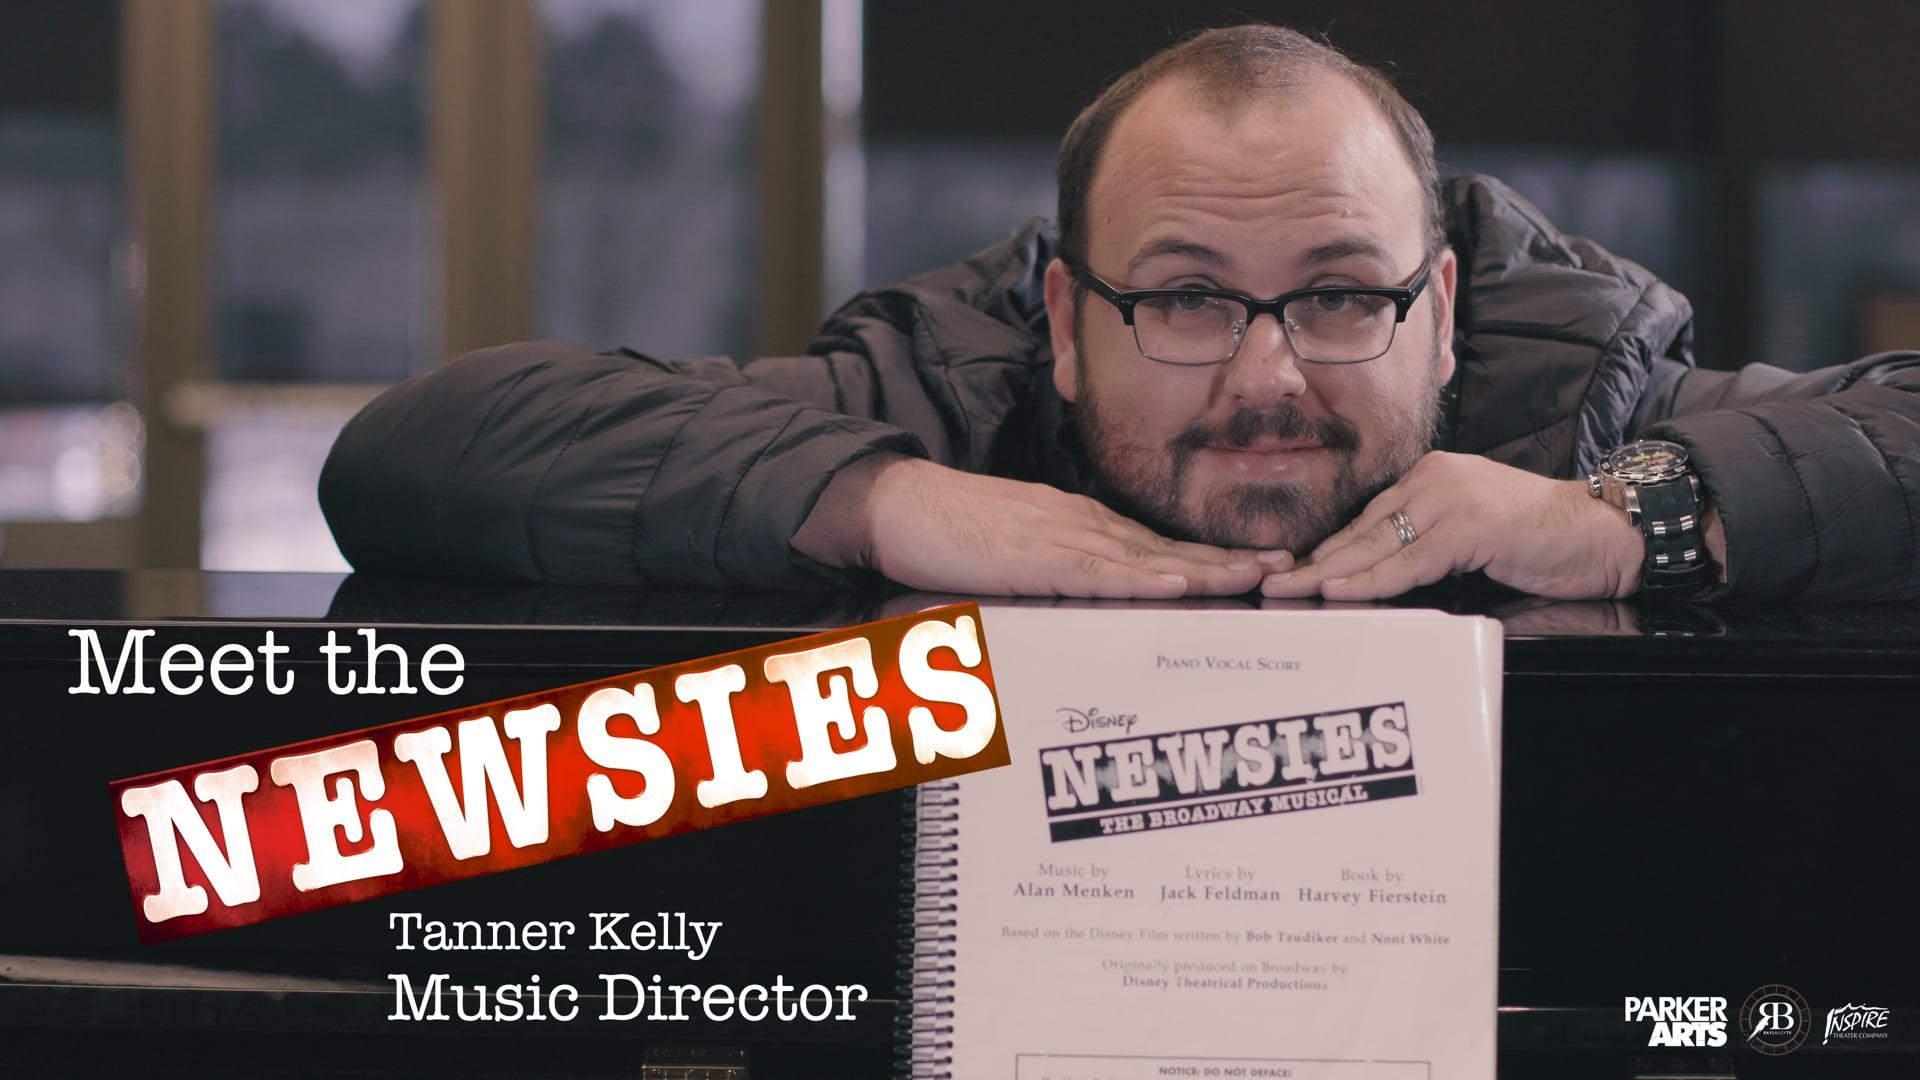 Meet the Newsies - Tanner Kelly (Music Director)